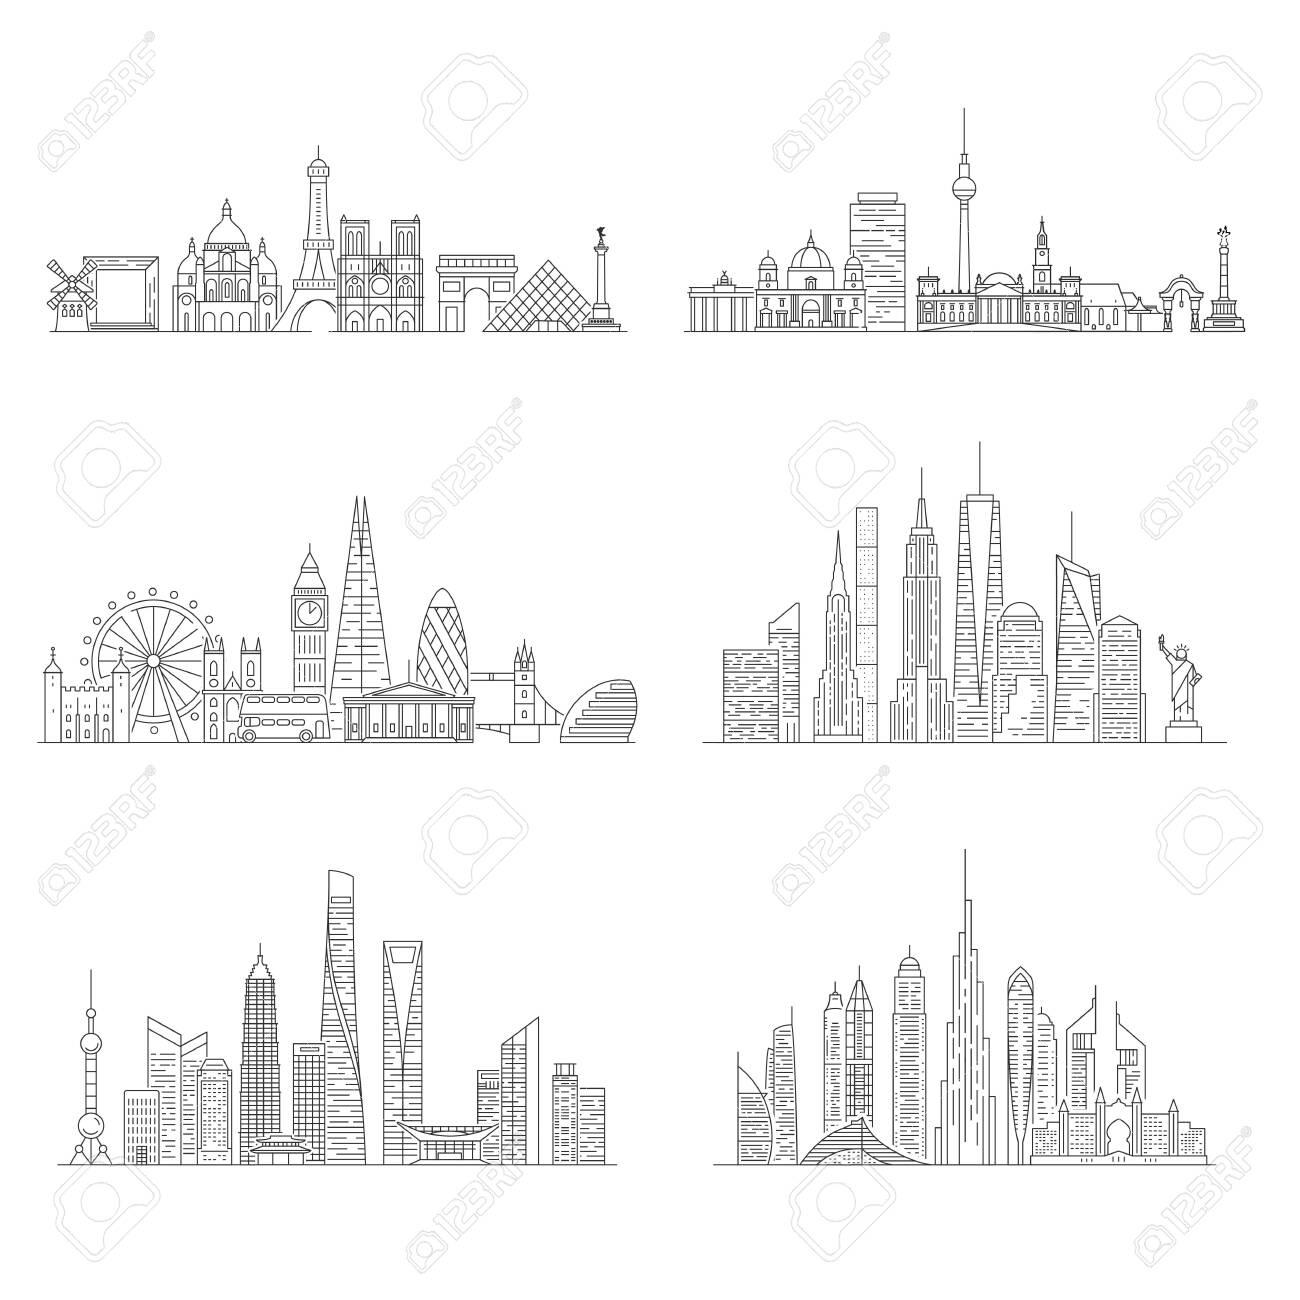 Cities skylines set. New York, London, Paris, Berlin, Dubai, Shanghai Vector illustration line art style - 124106855